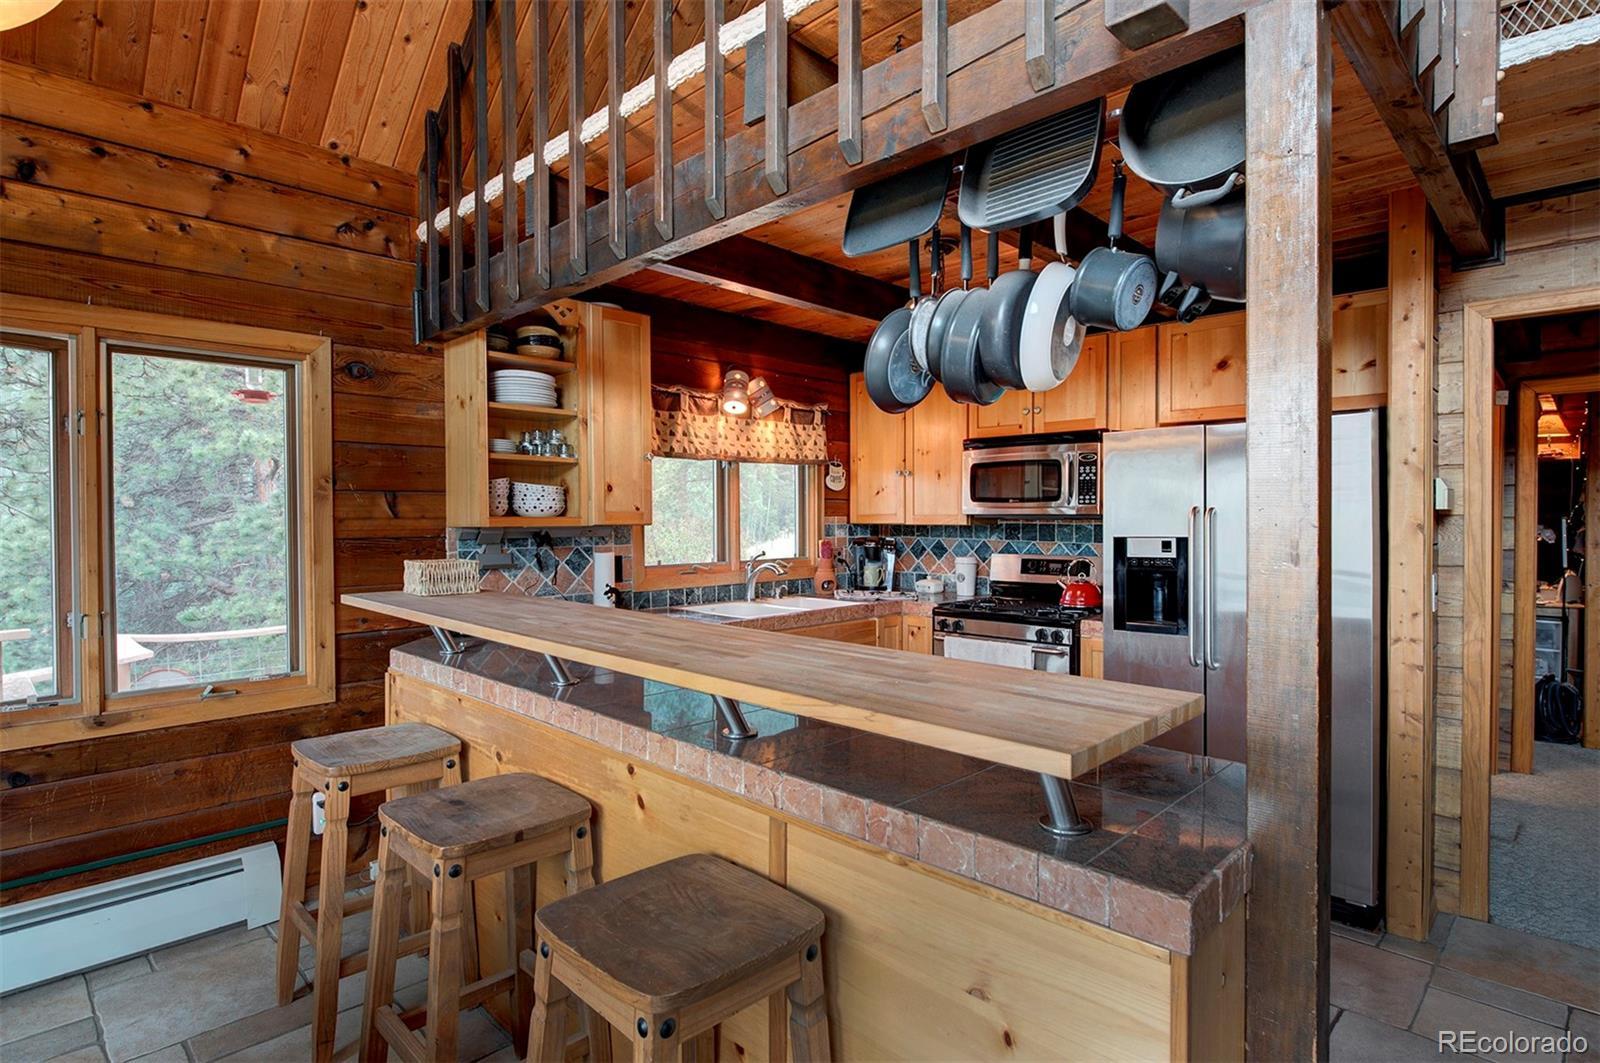 MLS# 6922377 - 11 - 12123 Geronimo Trail, Conifer, CO 80433